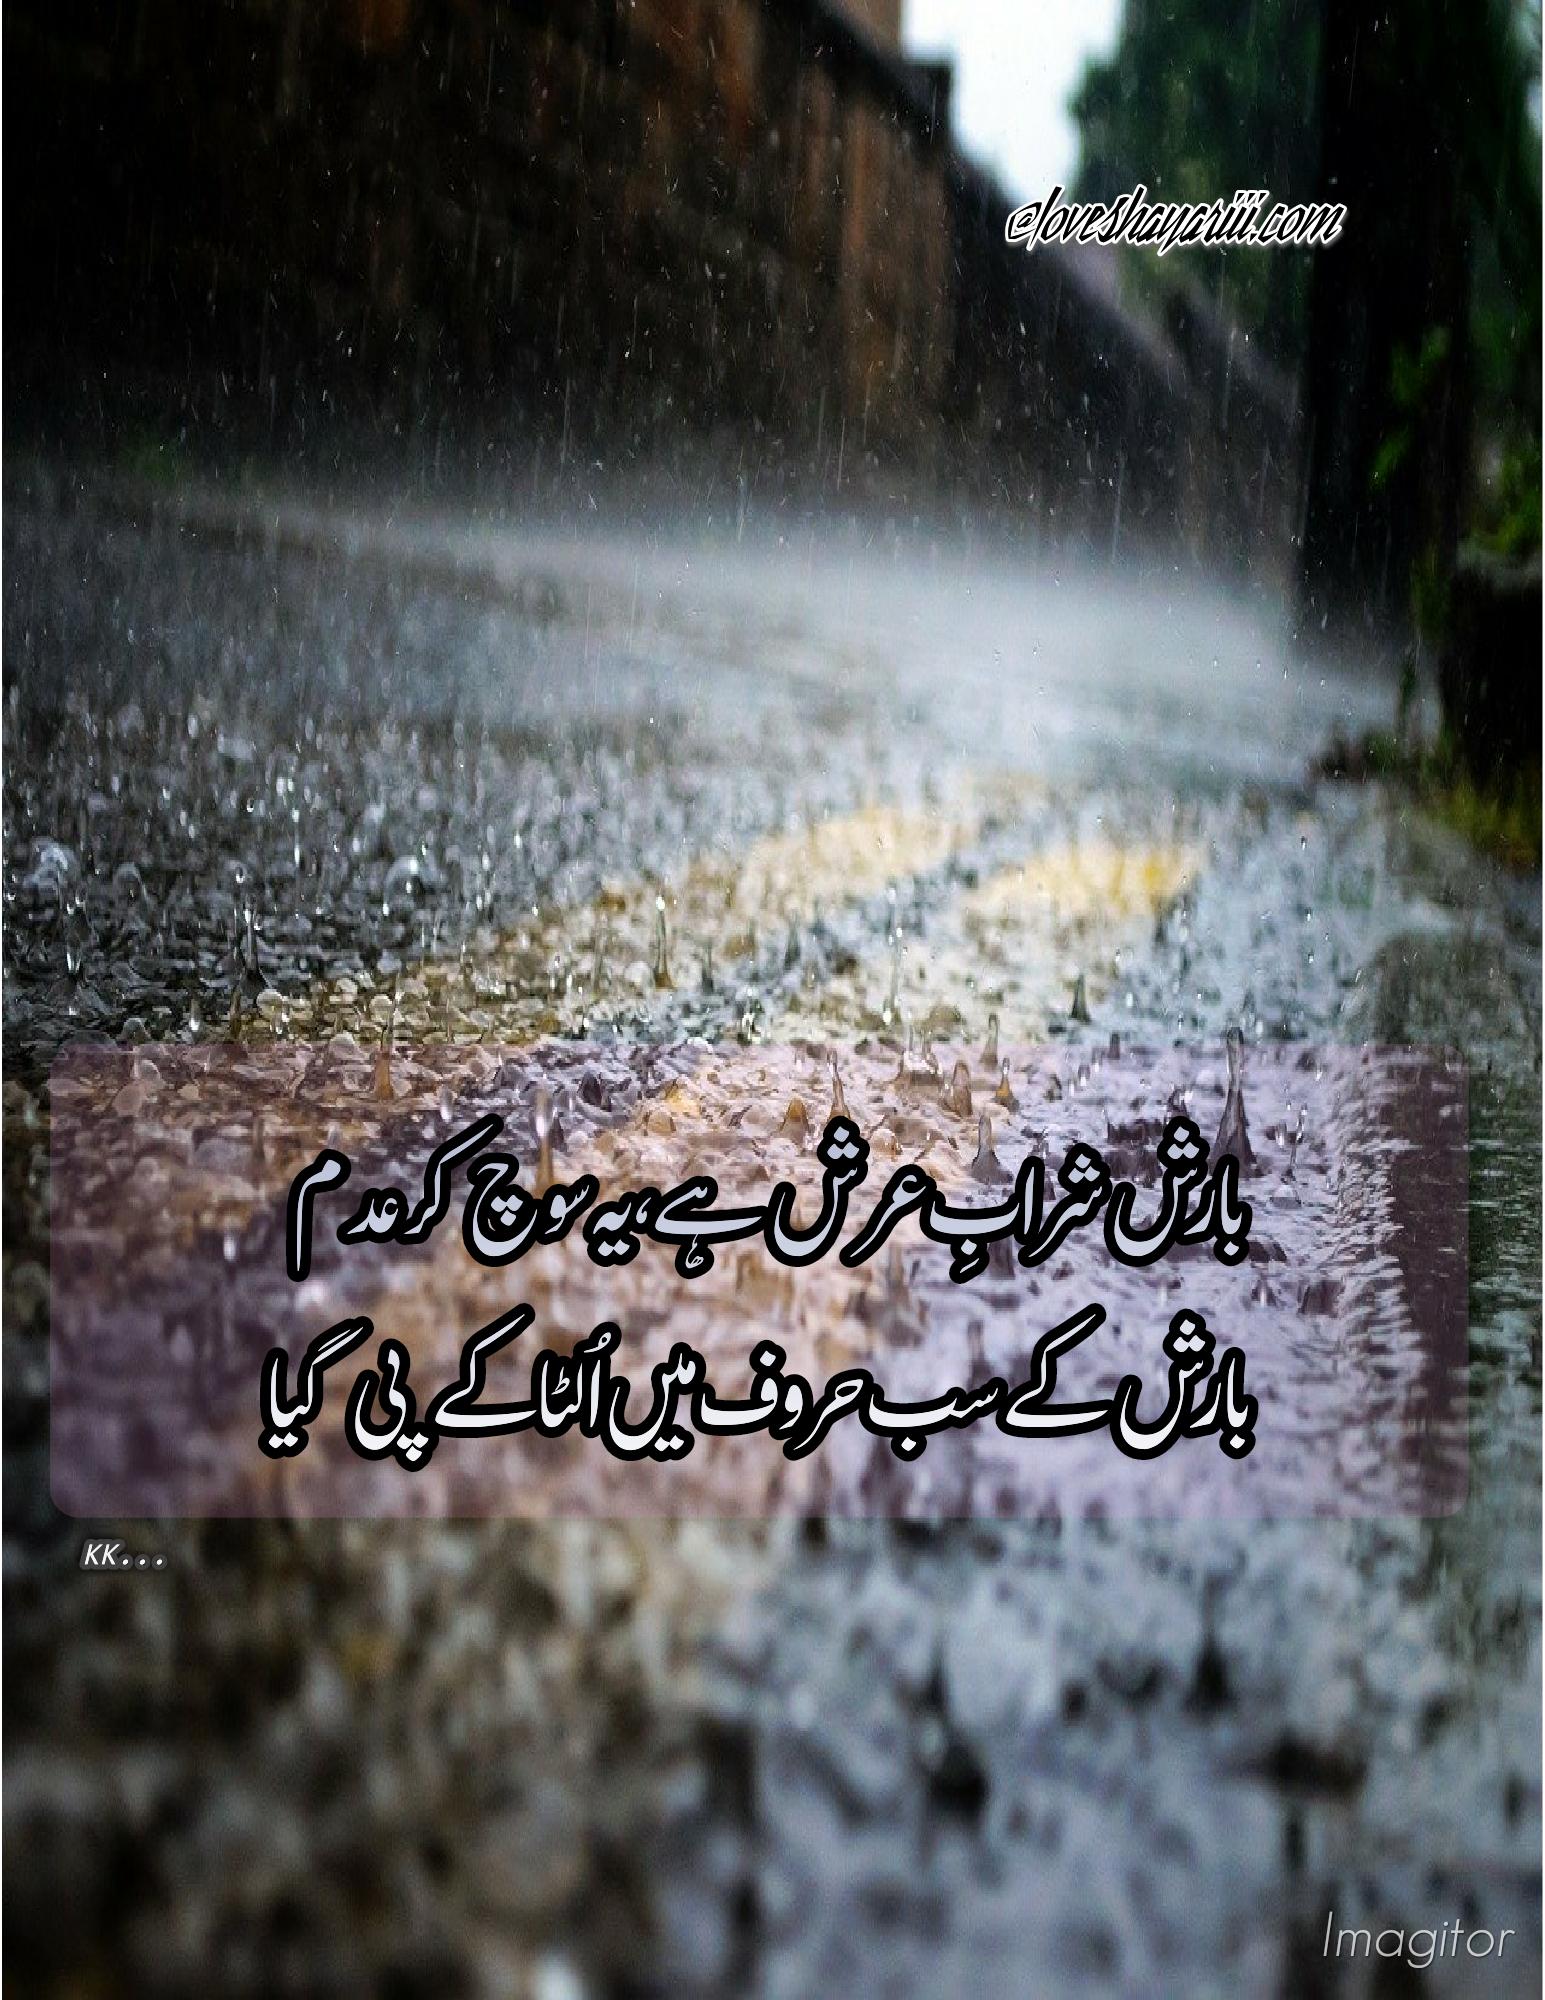 Rain Poetry Poetry Image Poetry Love Romantic Poetry